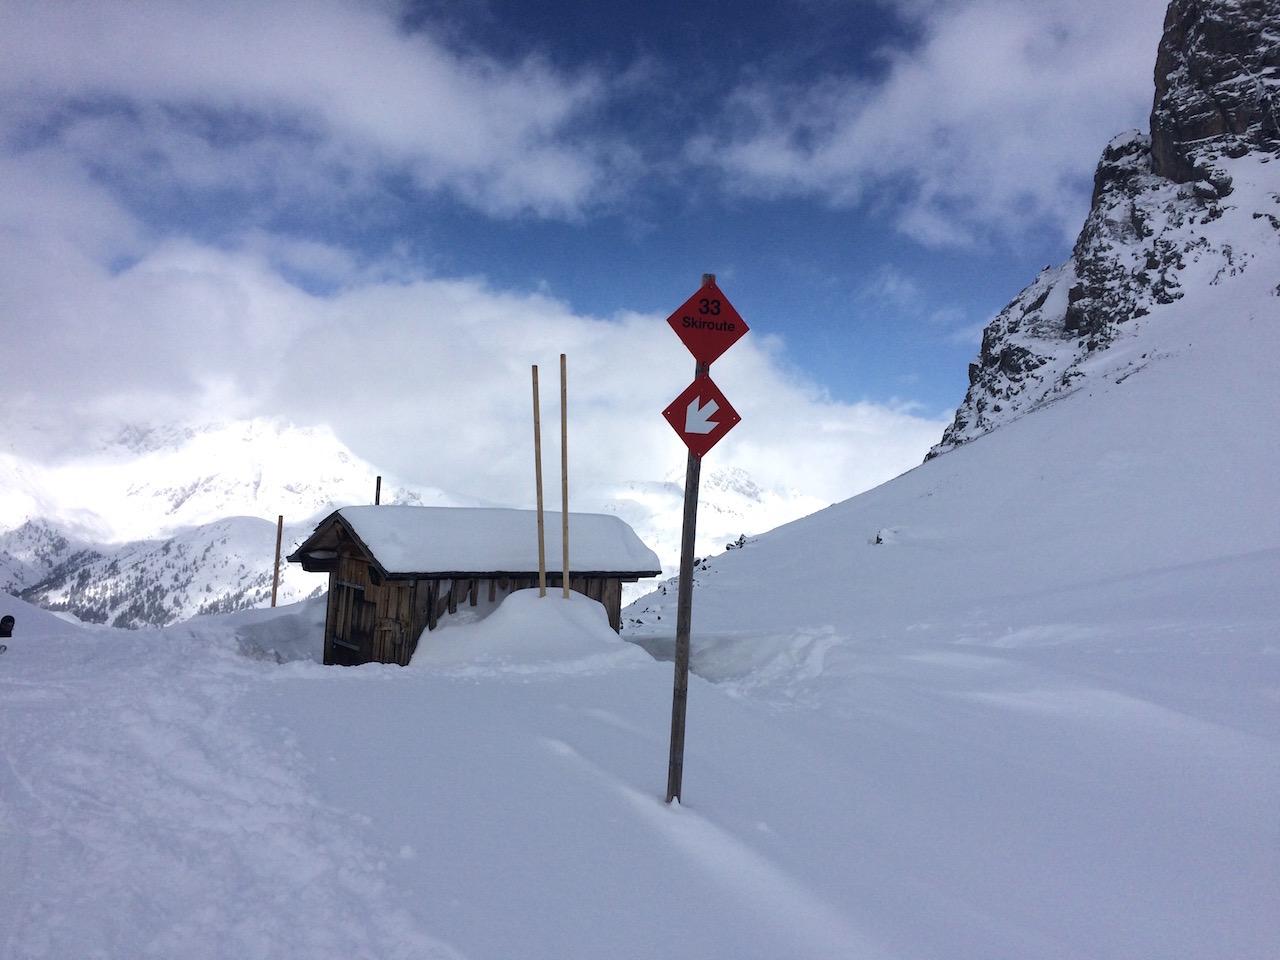 Skiroute Madloch nach Zug